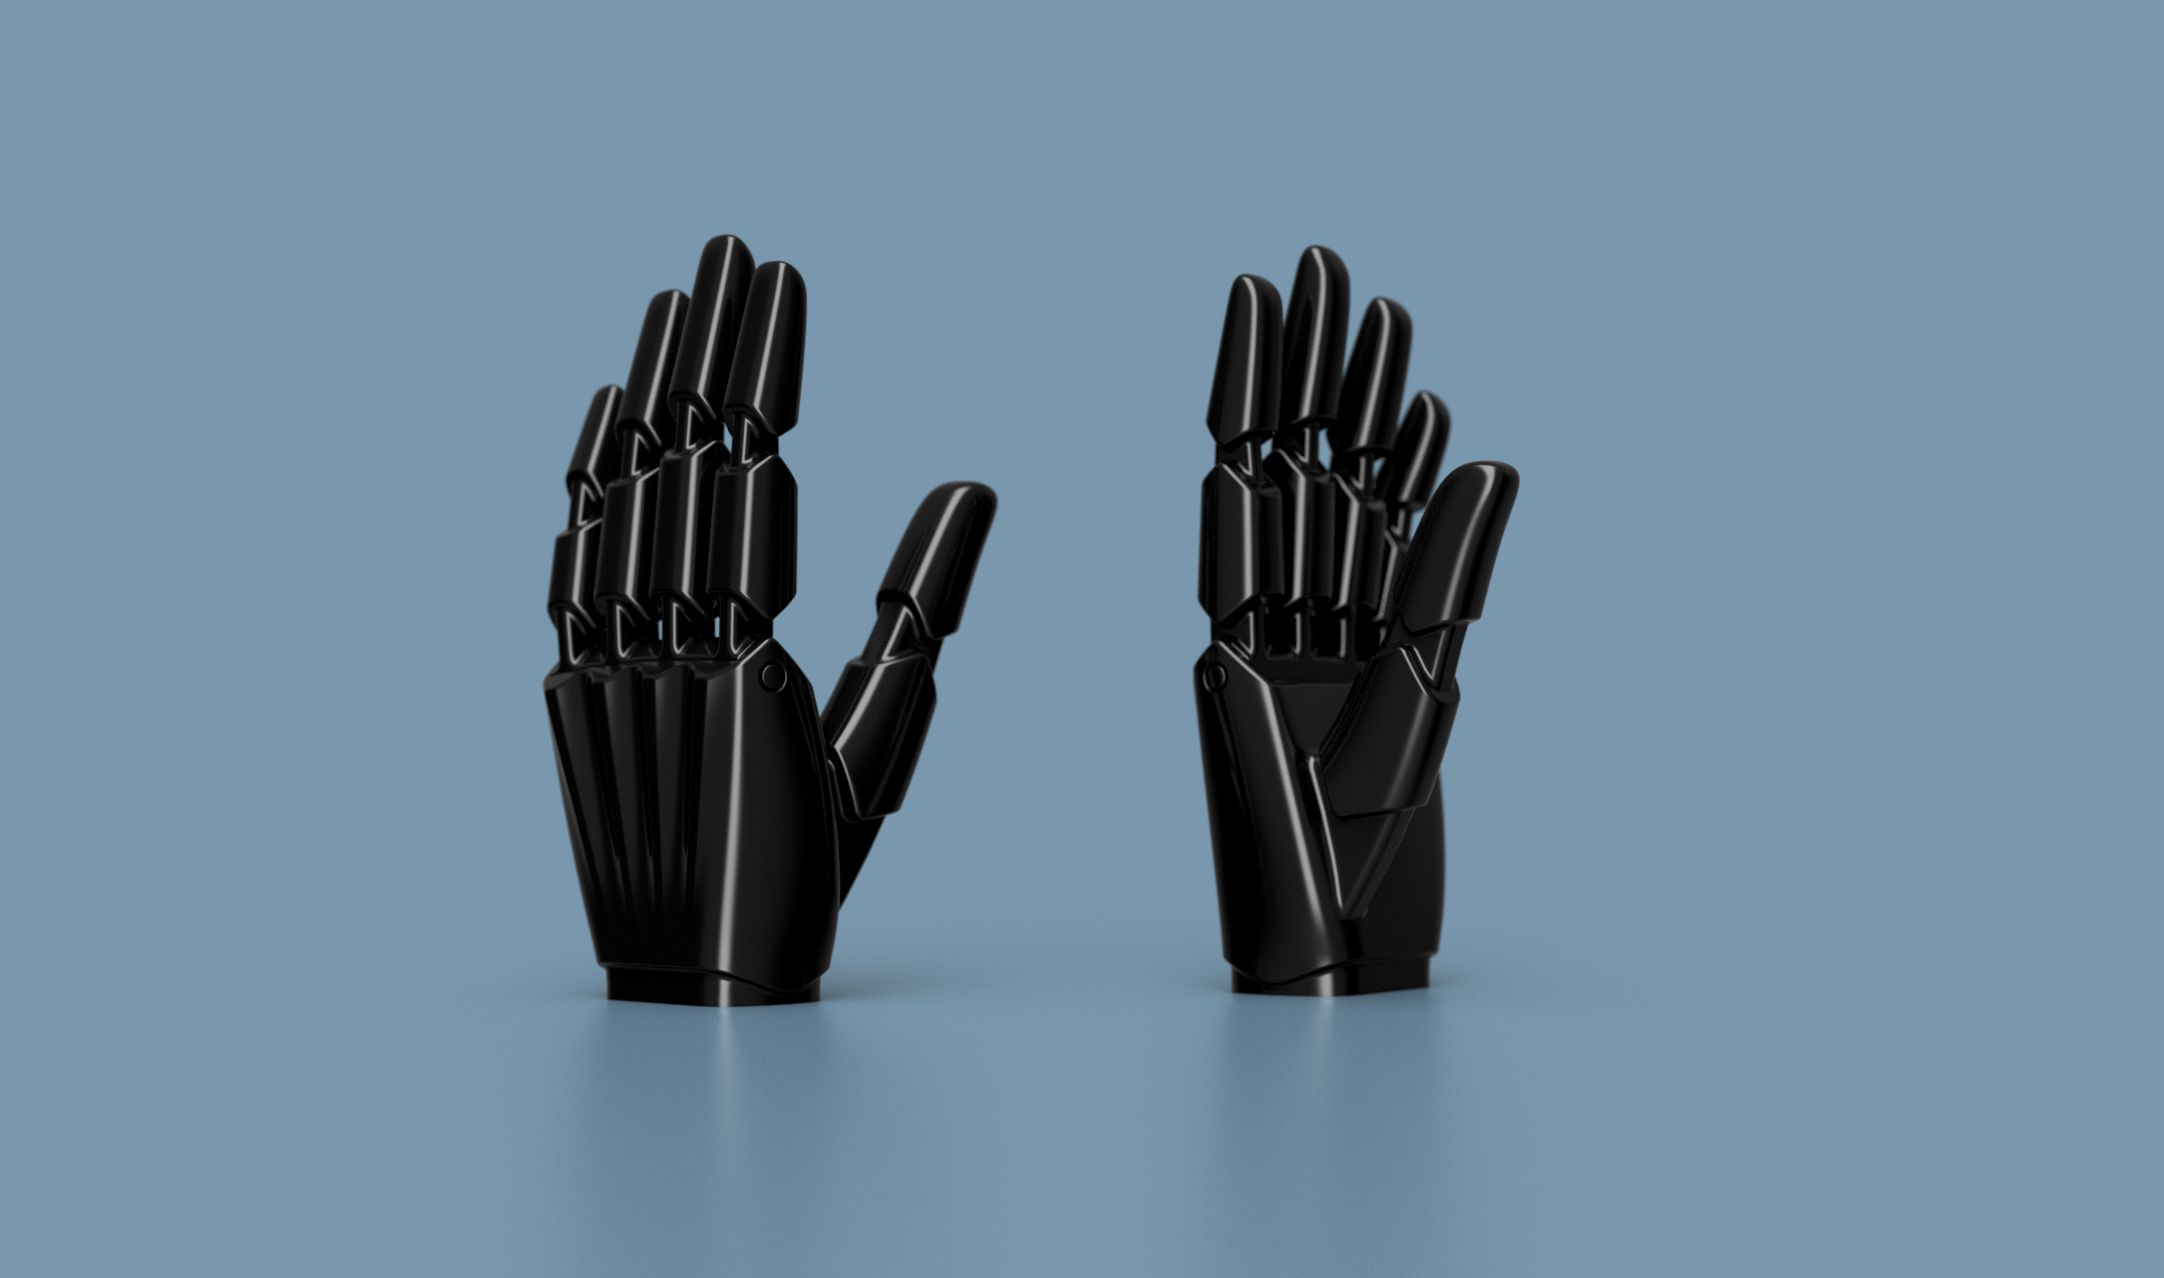 Robotic1-3500-3500